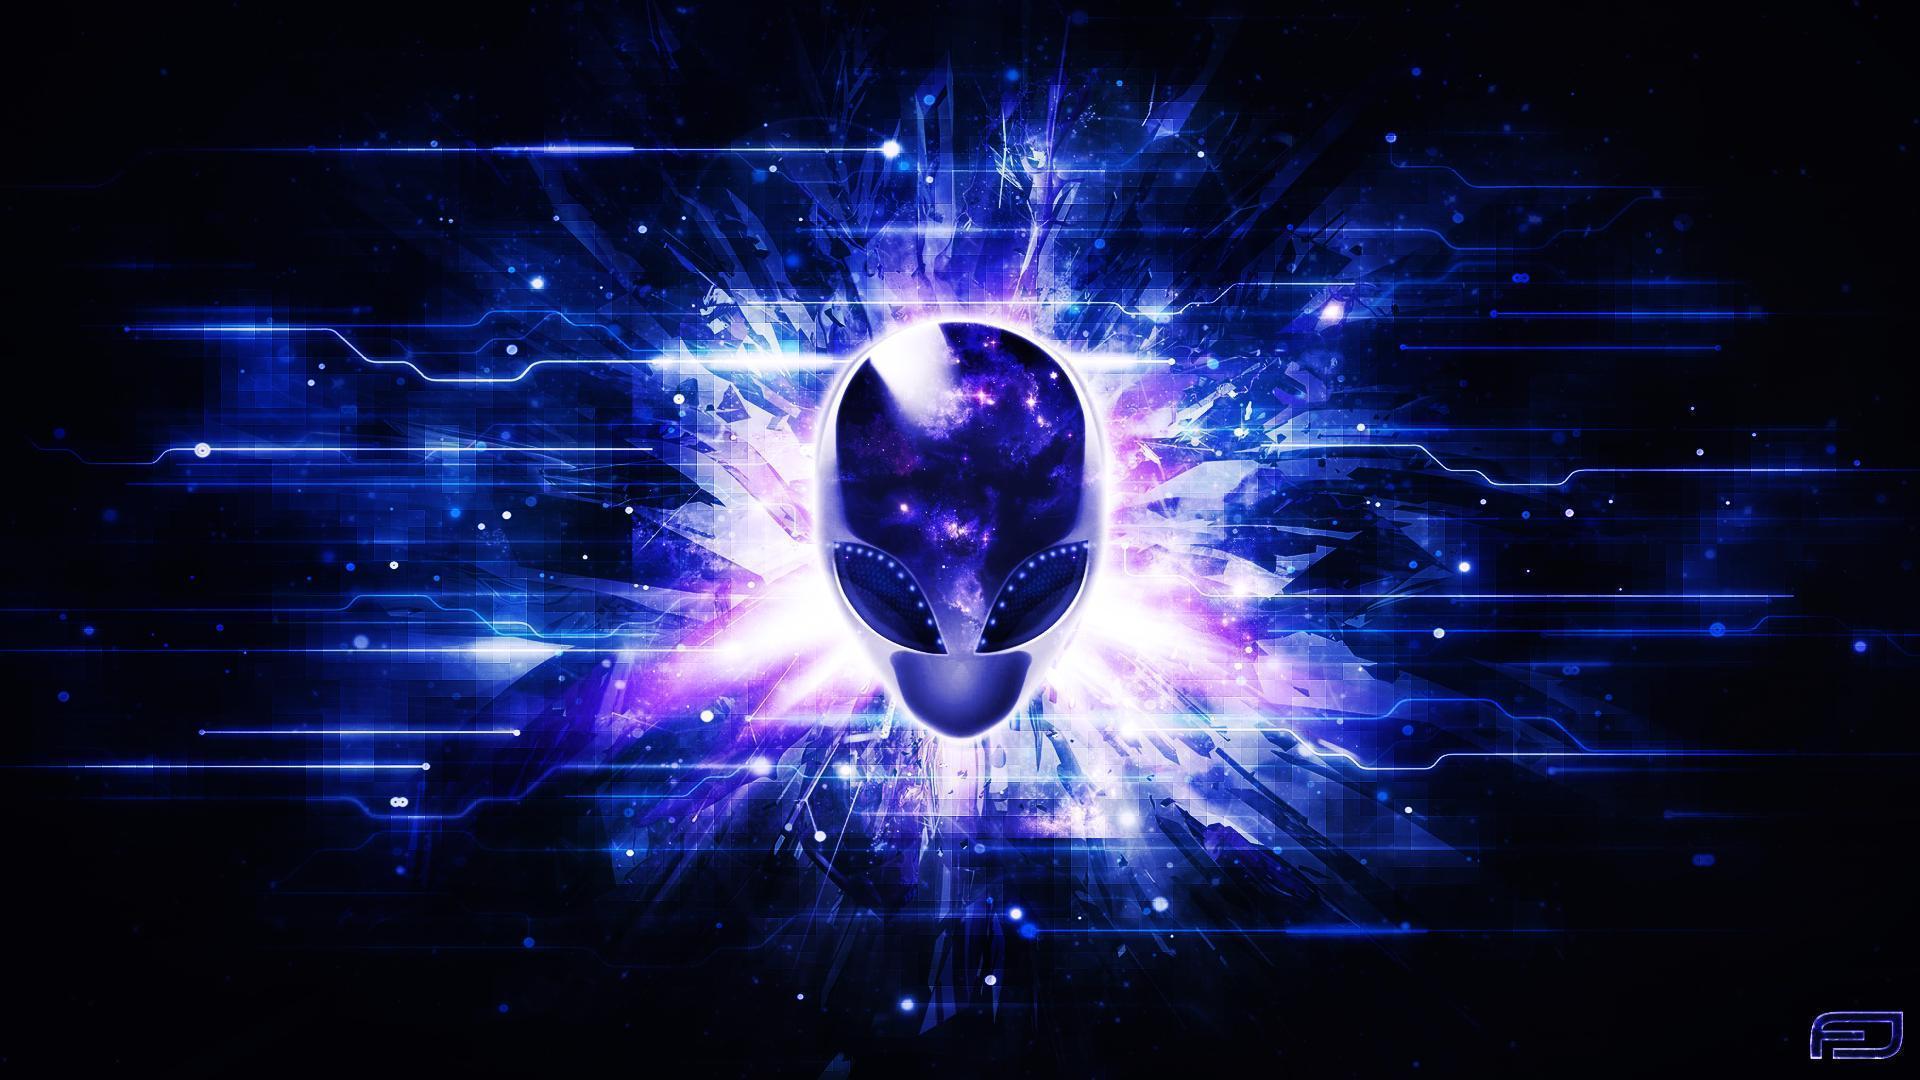 Images of alienware alien black background fan hd alienware wallpapers wallpaper cave voltagebd Images